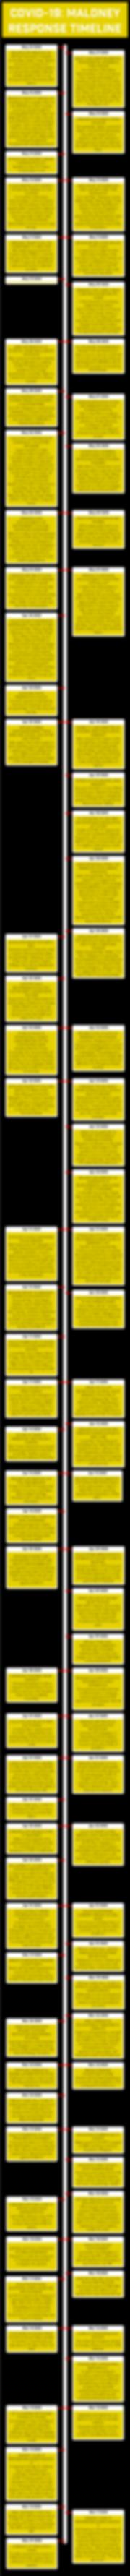 Maloney COVID timeline chart - 5-23-20.p